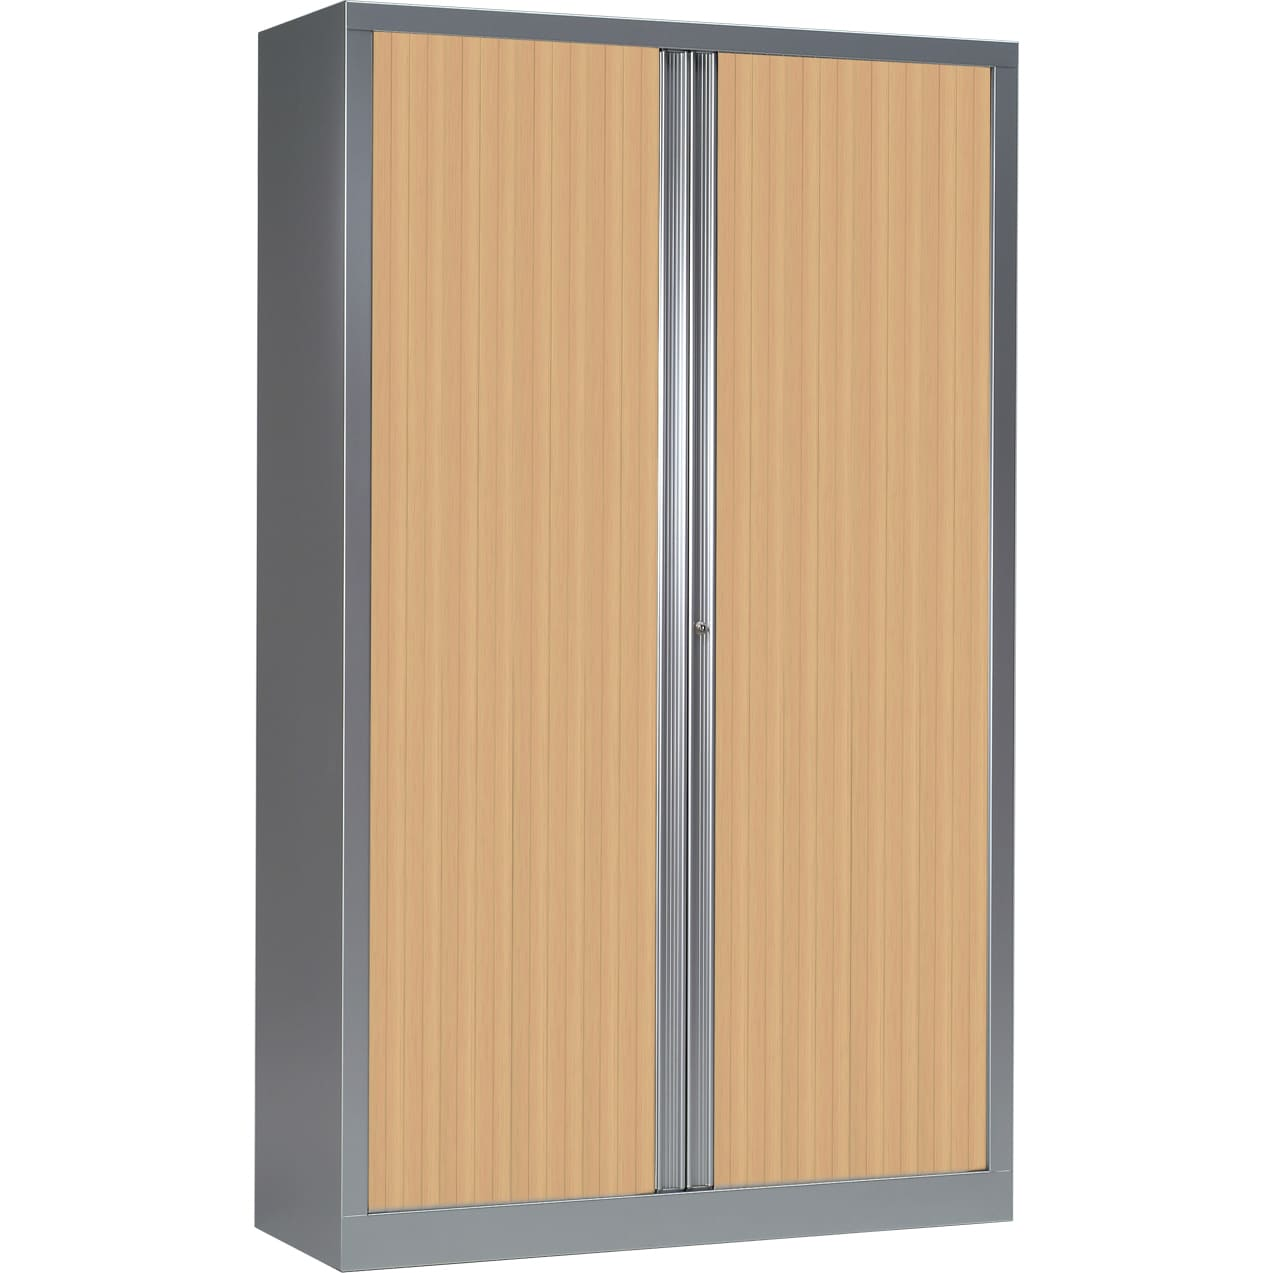 armoire alu rideaux chene clair h198 l120 serie plus